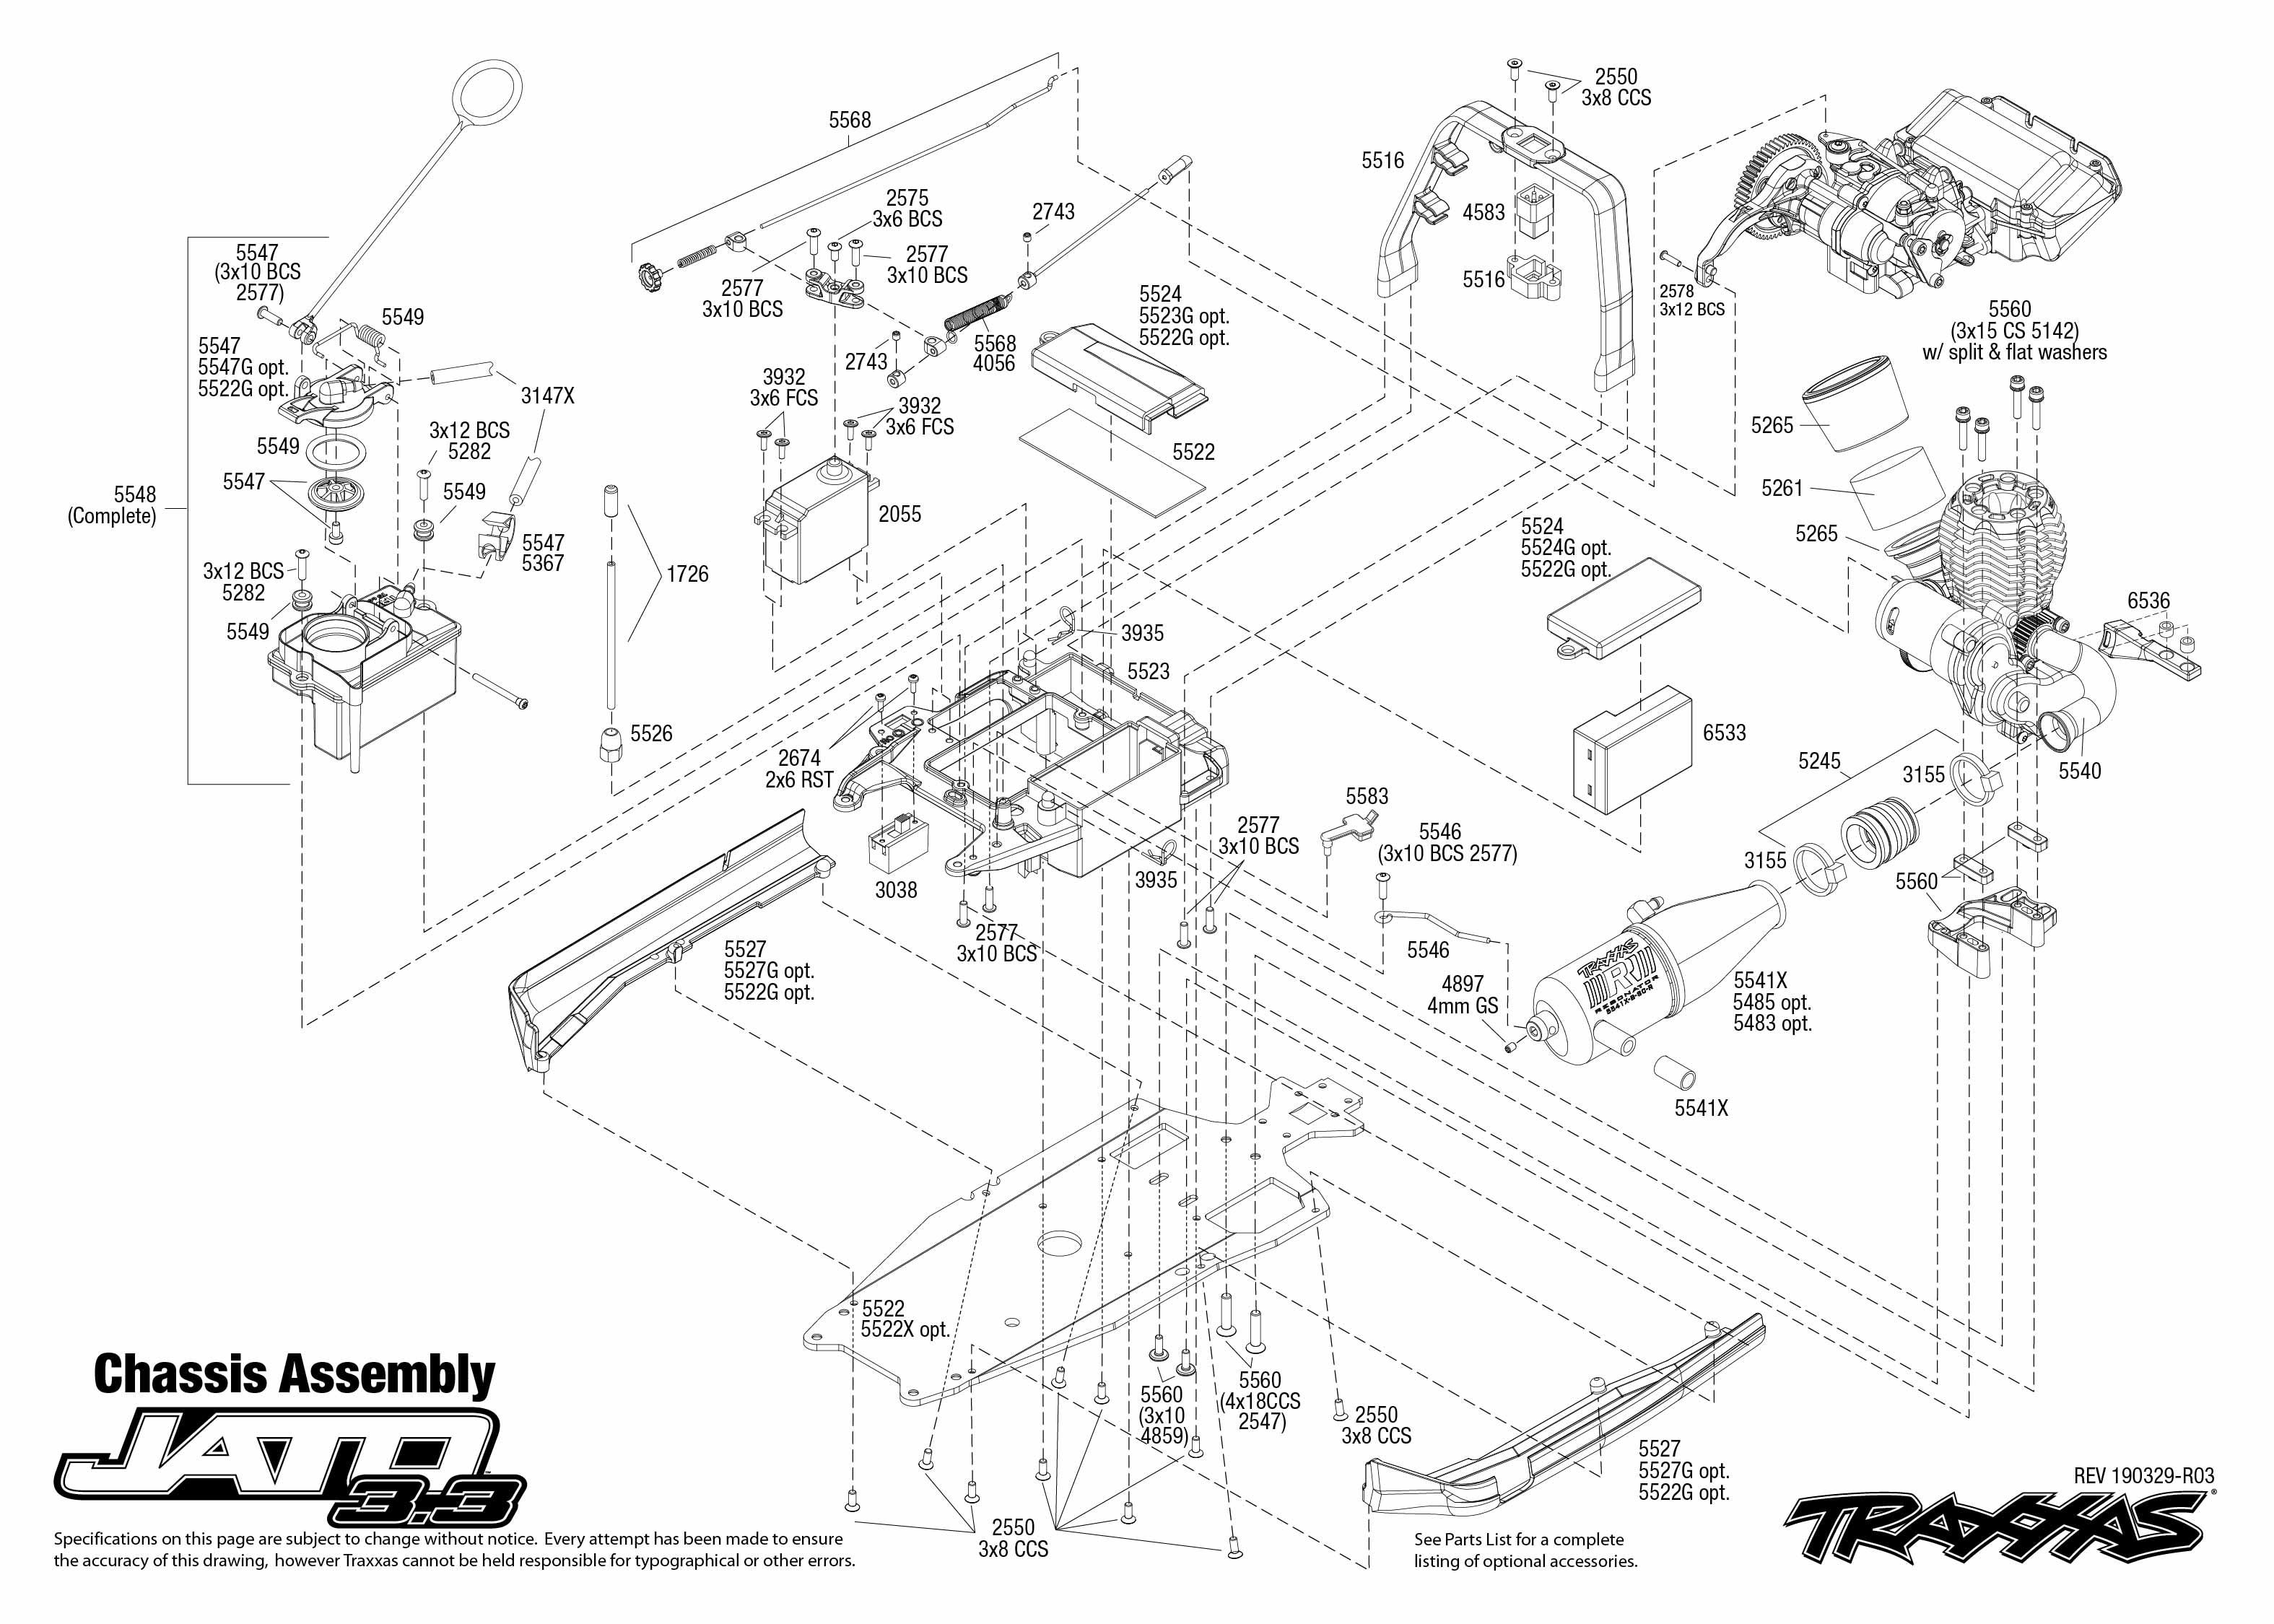 Traxxas Jato 3.3 2-Speed Nitro-Powered 2WD 1/10 Stadium